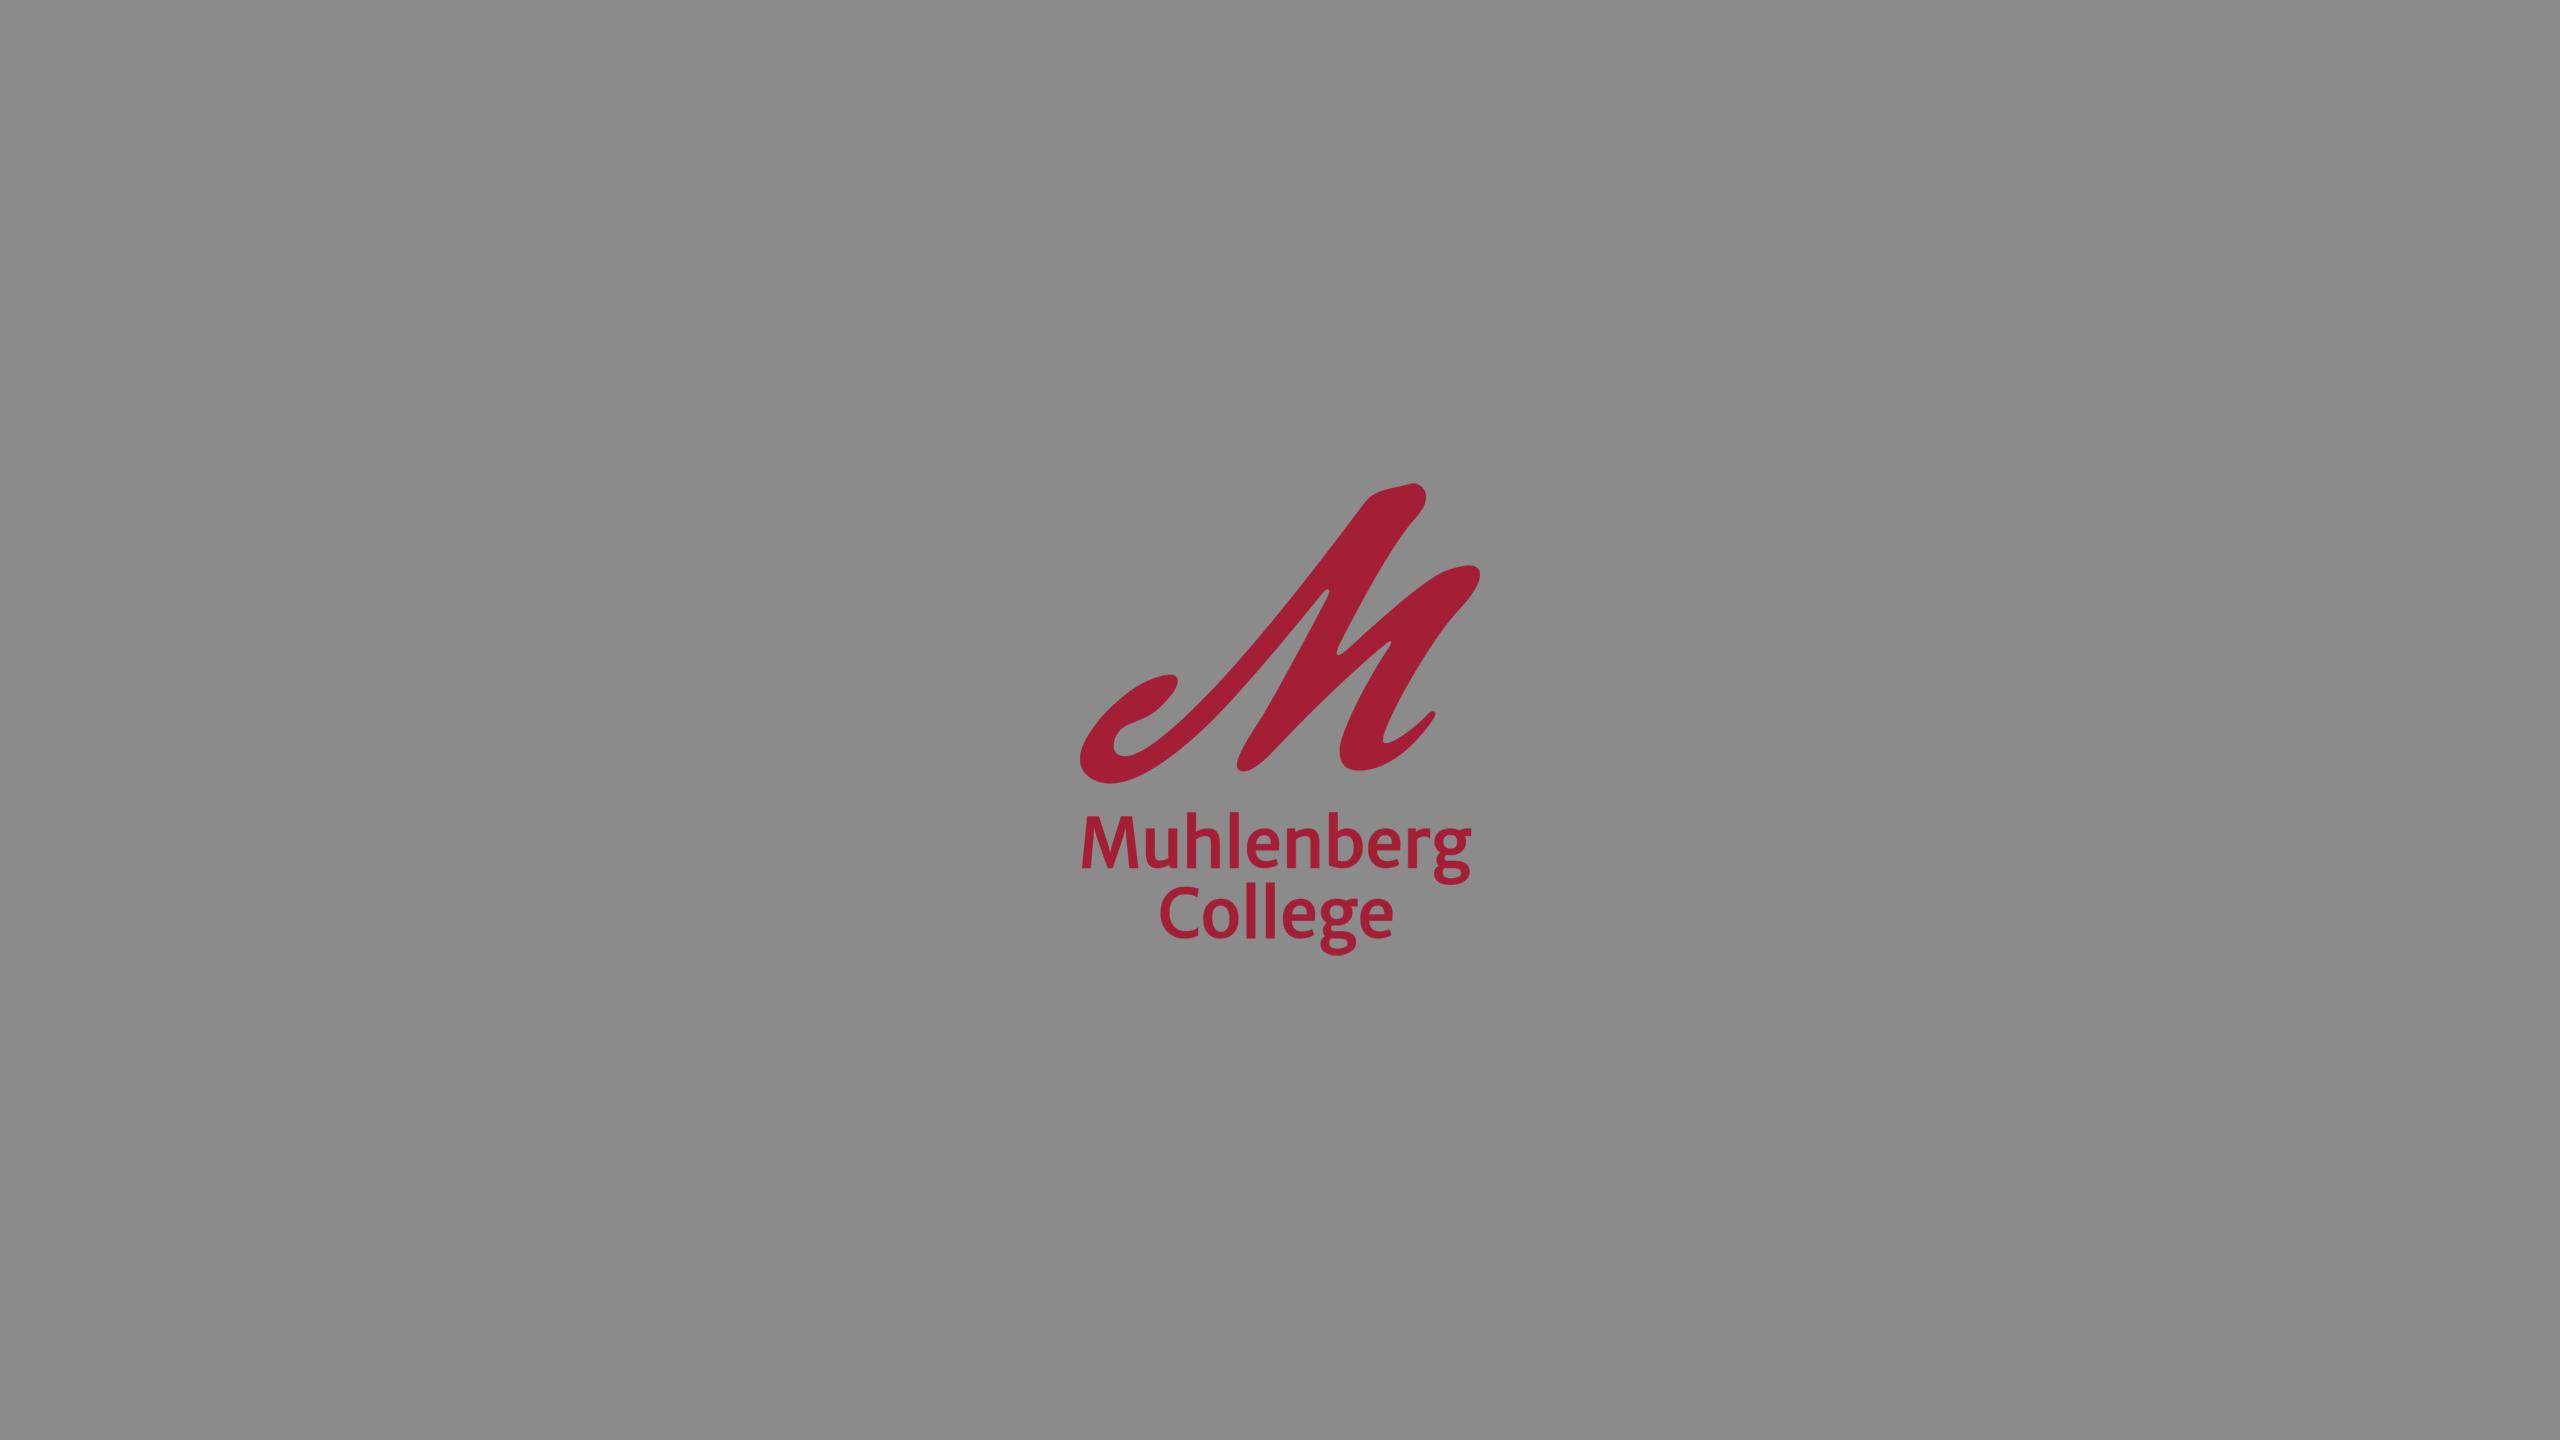 Muhlenberg (PA) College Mules